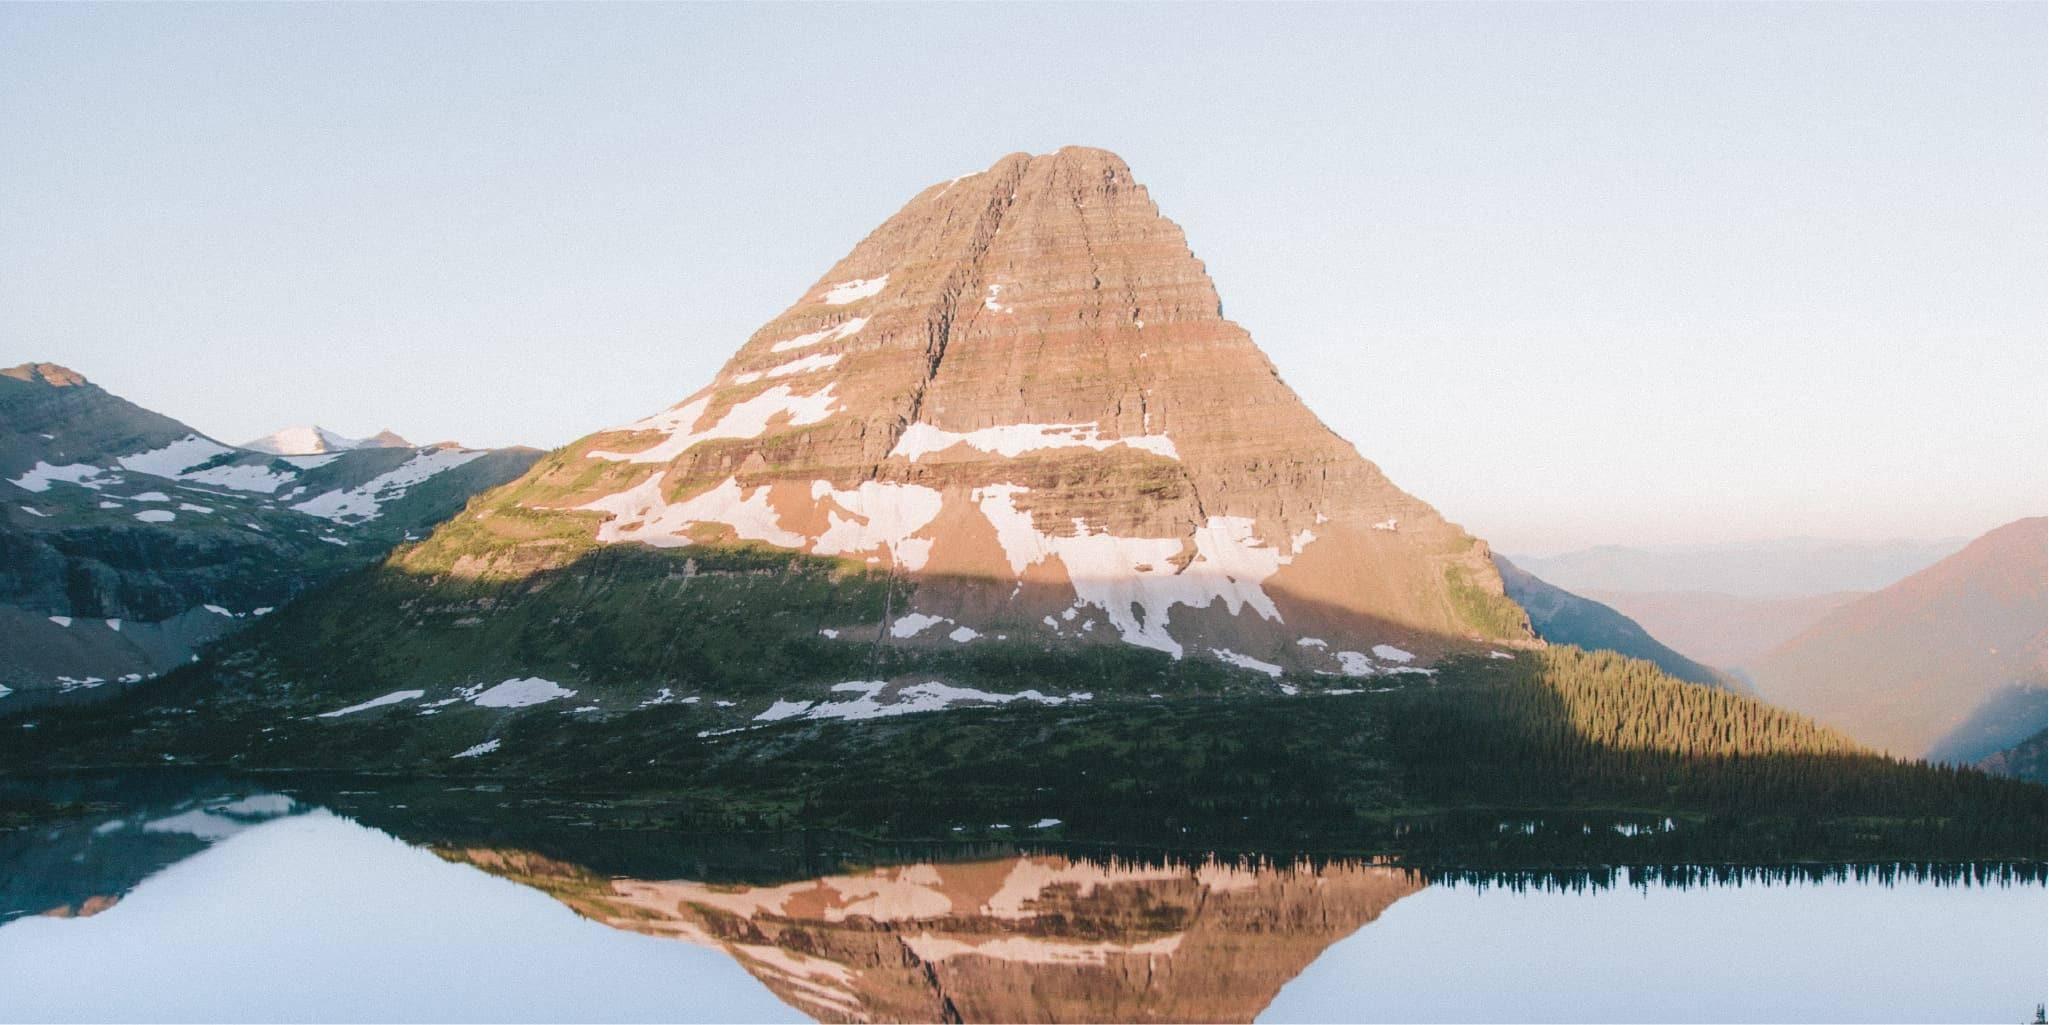 Mountains over a reflective lake